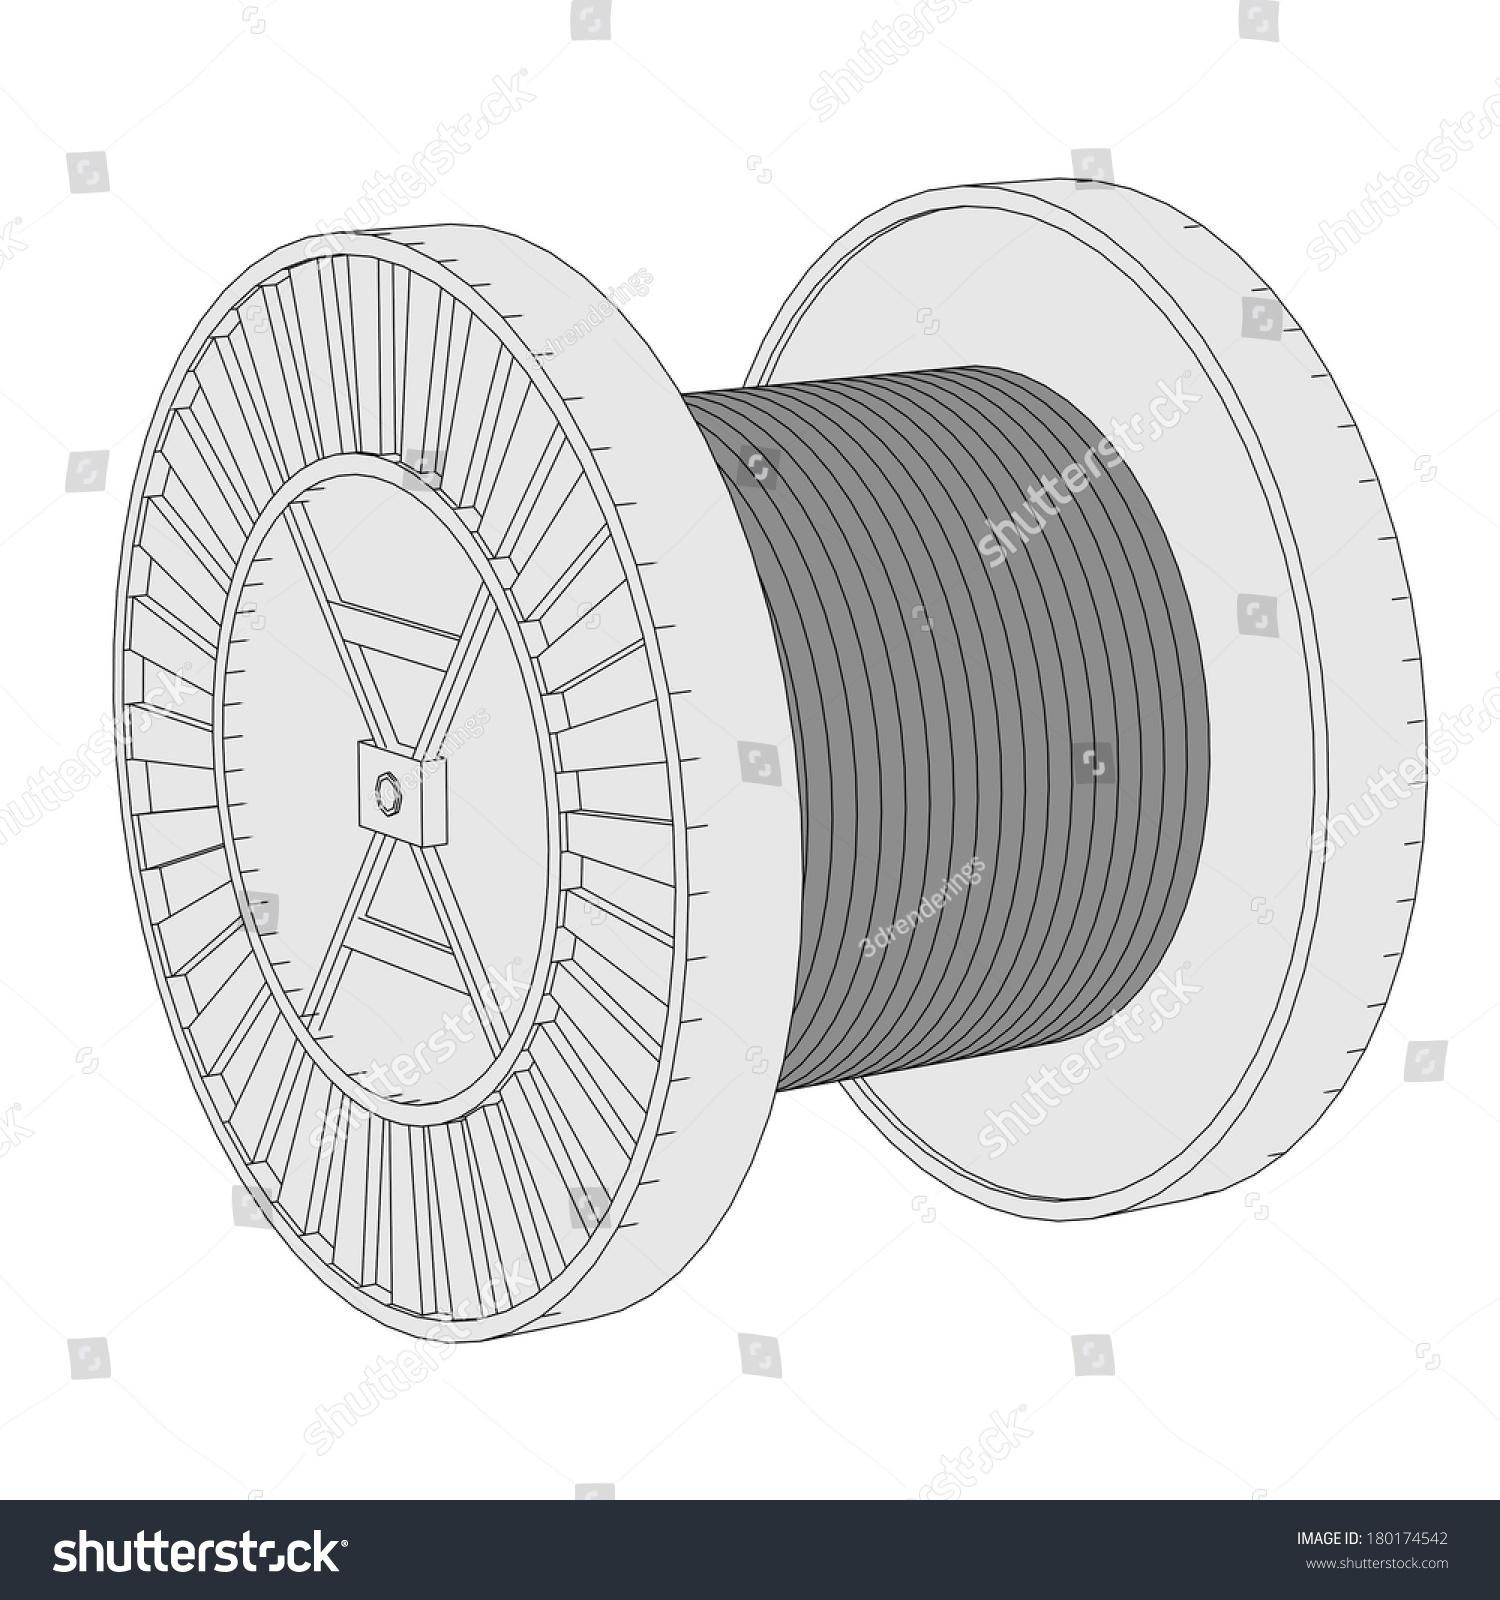 Cartoon Image Wire Spool Stock Illustration 180174542 - Shutterstock